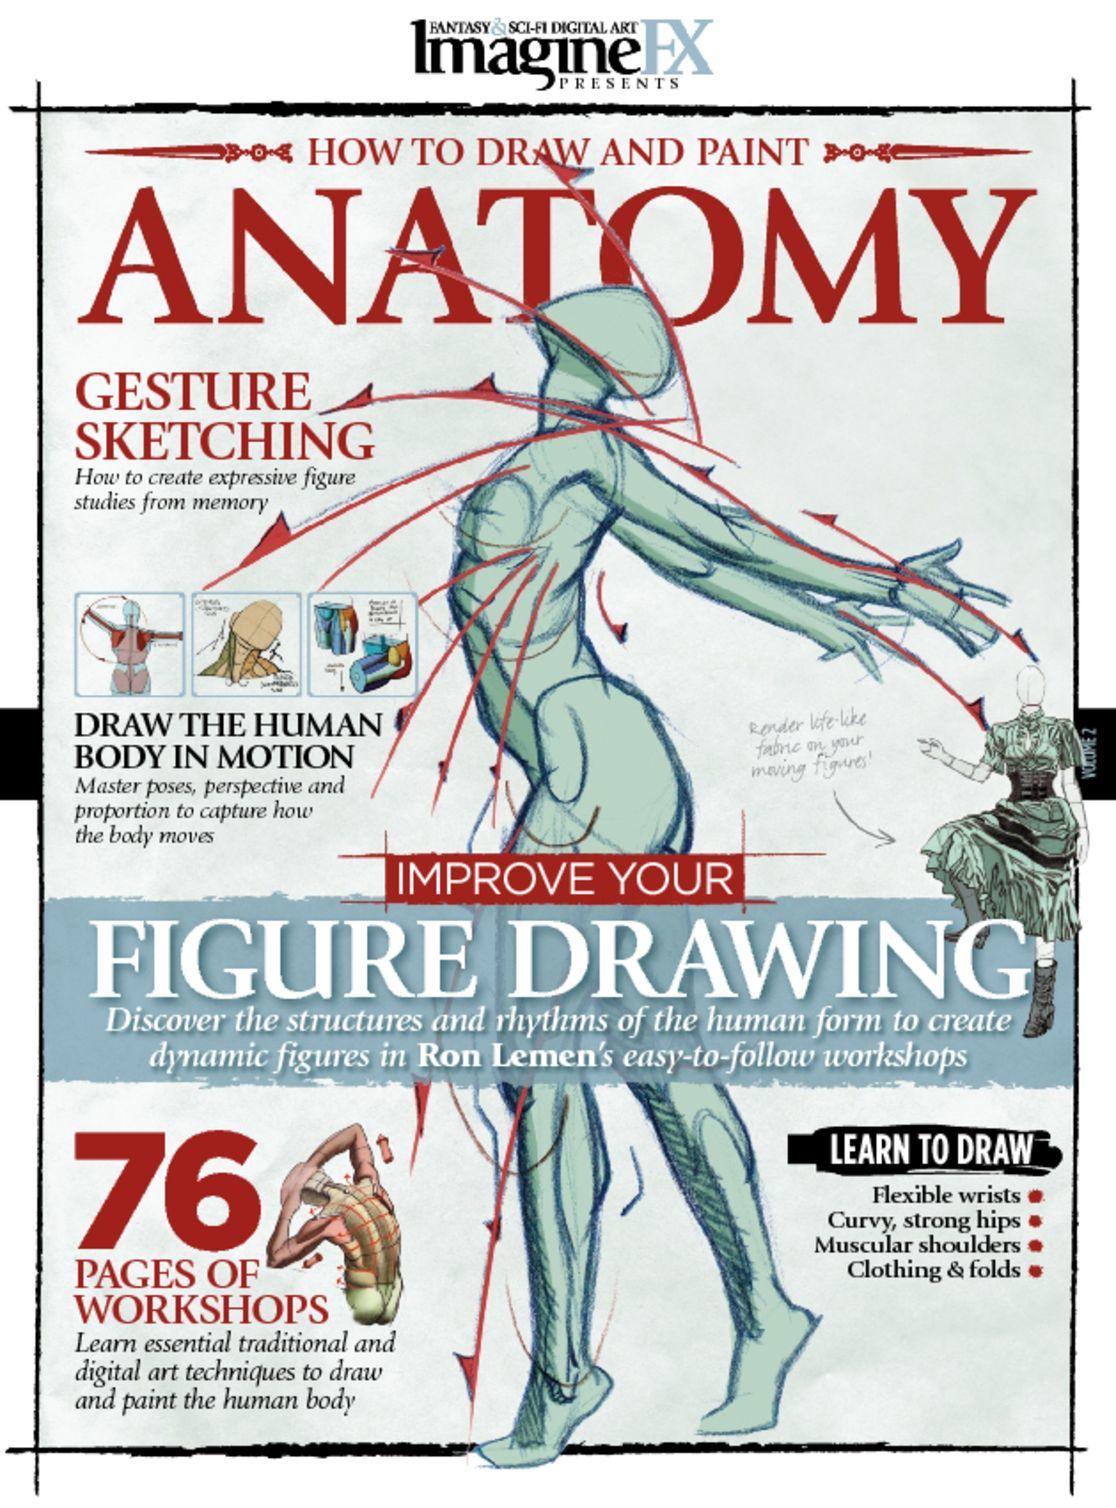 ImagineFX Presents Anatomy Magazine (Digital) - DiscountMags.com